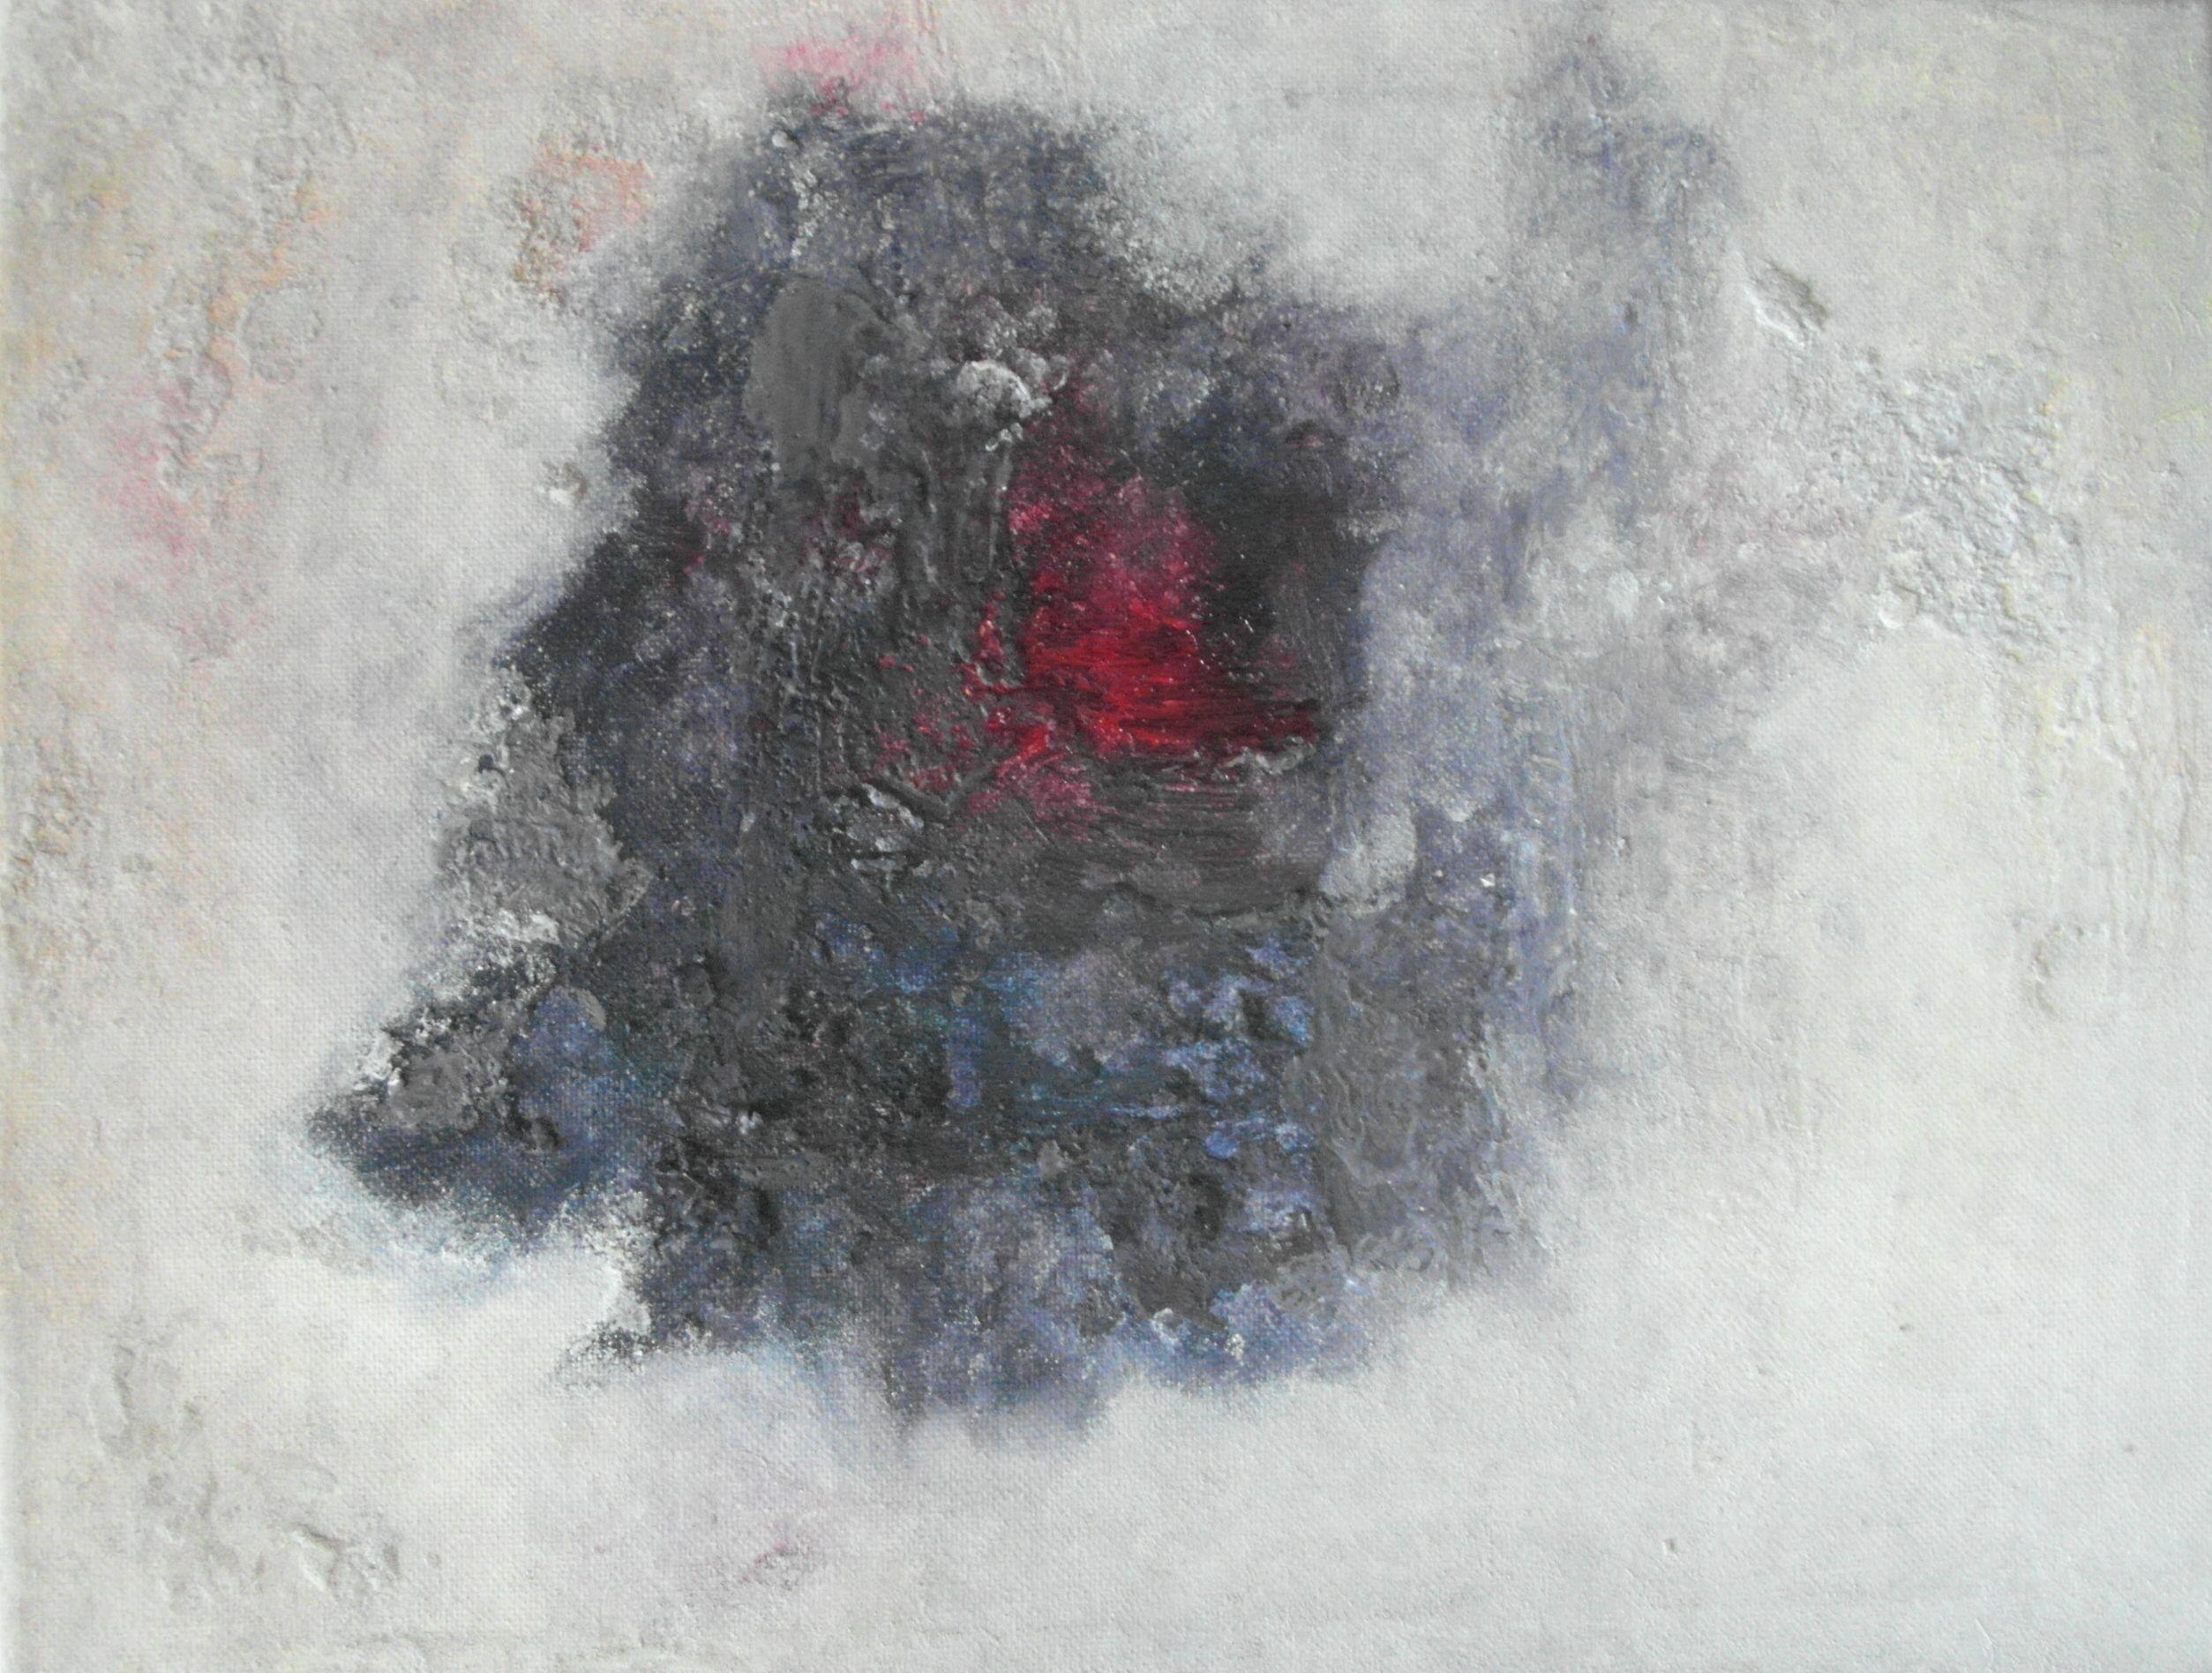 """Beholder"" Encaustic oil on stretched canvas. Julie Sumerta"